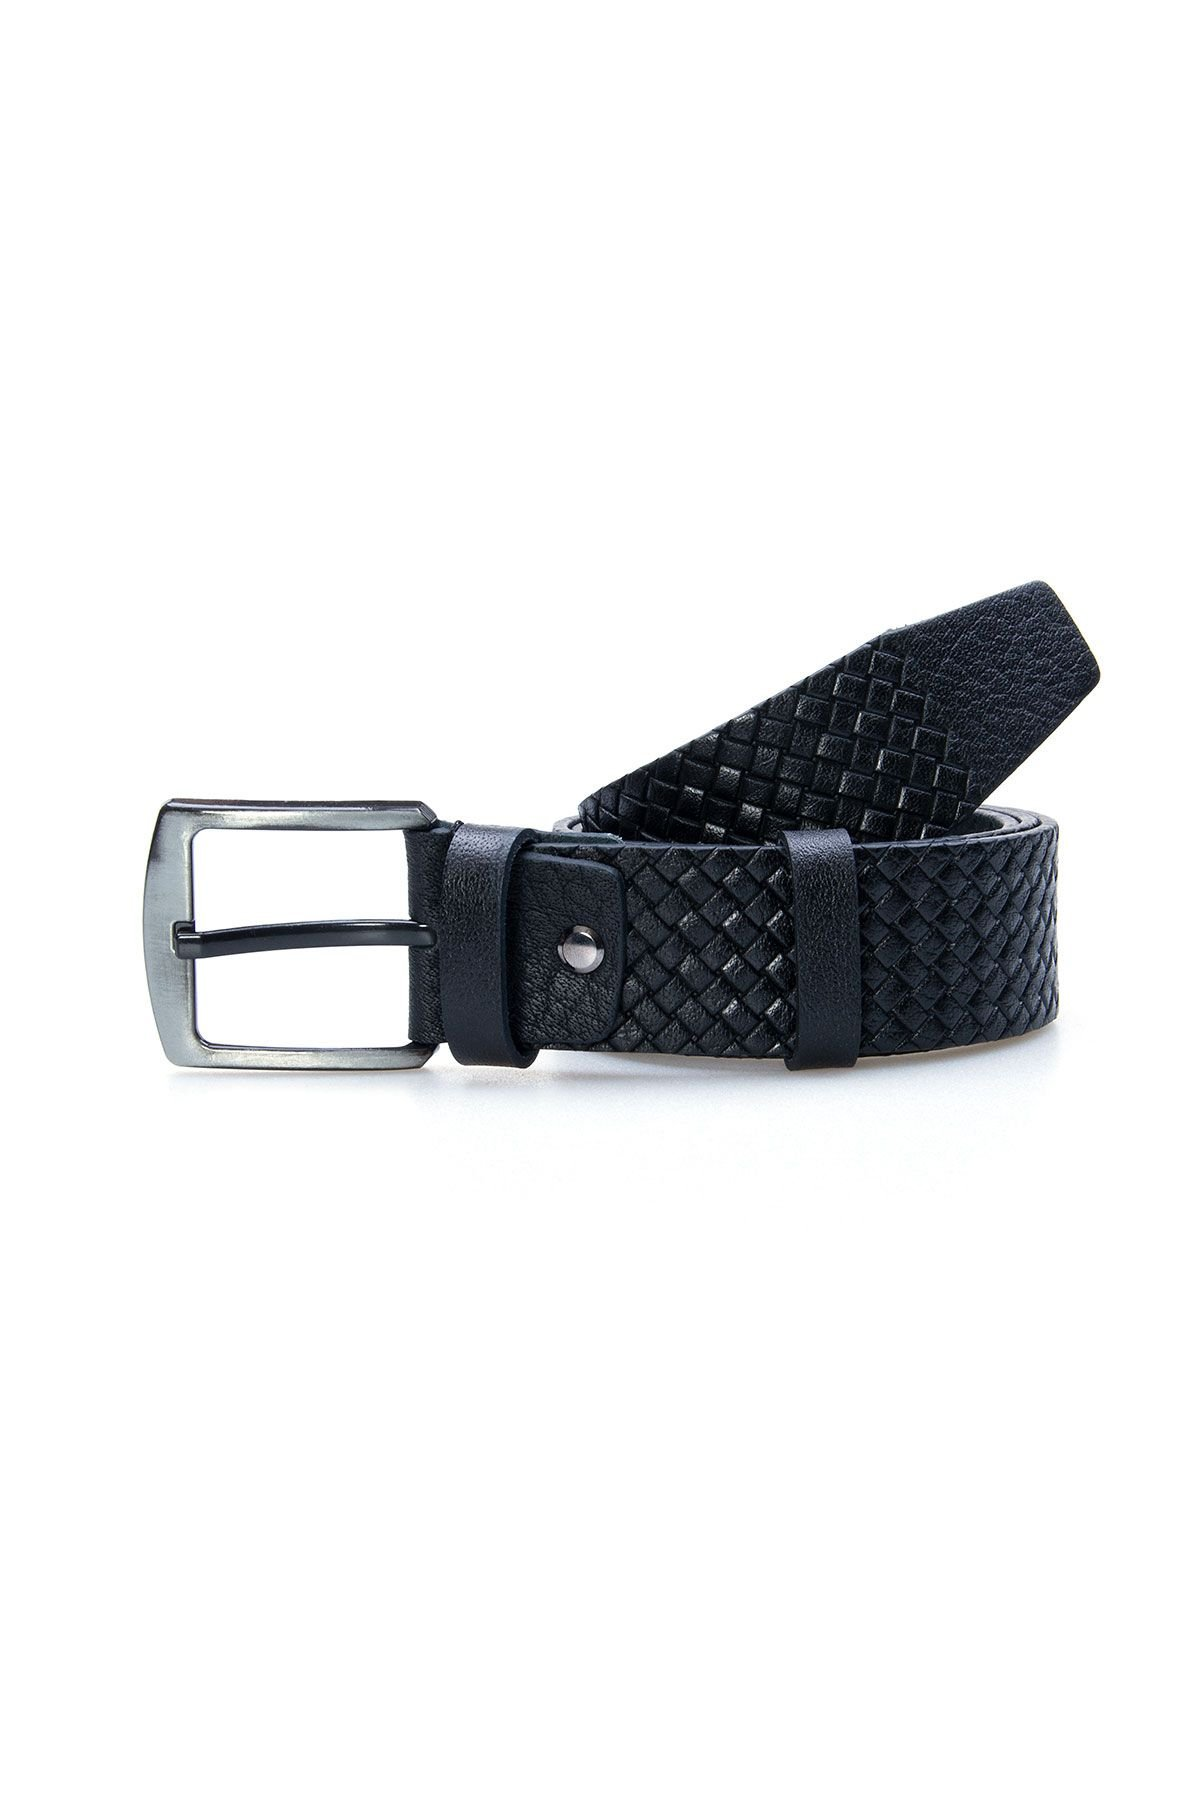 Pegia Genuine Leather Men's Belt 19KMR09 Black